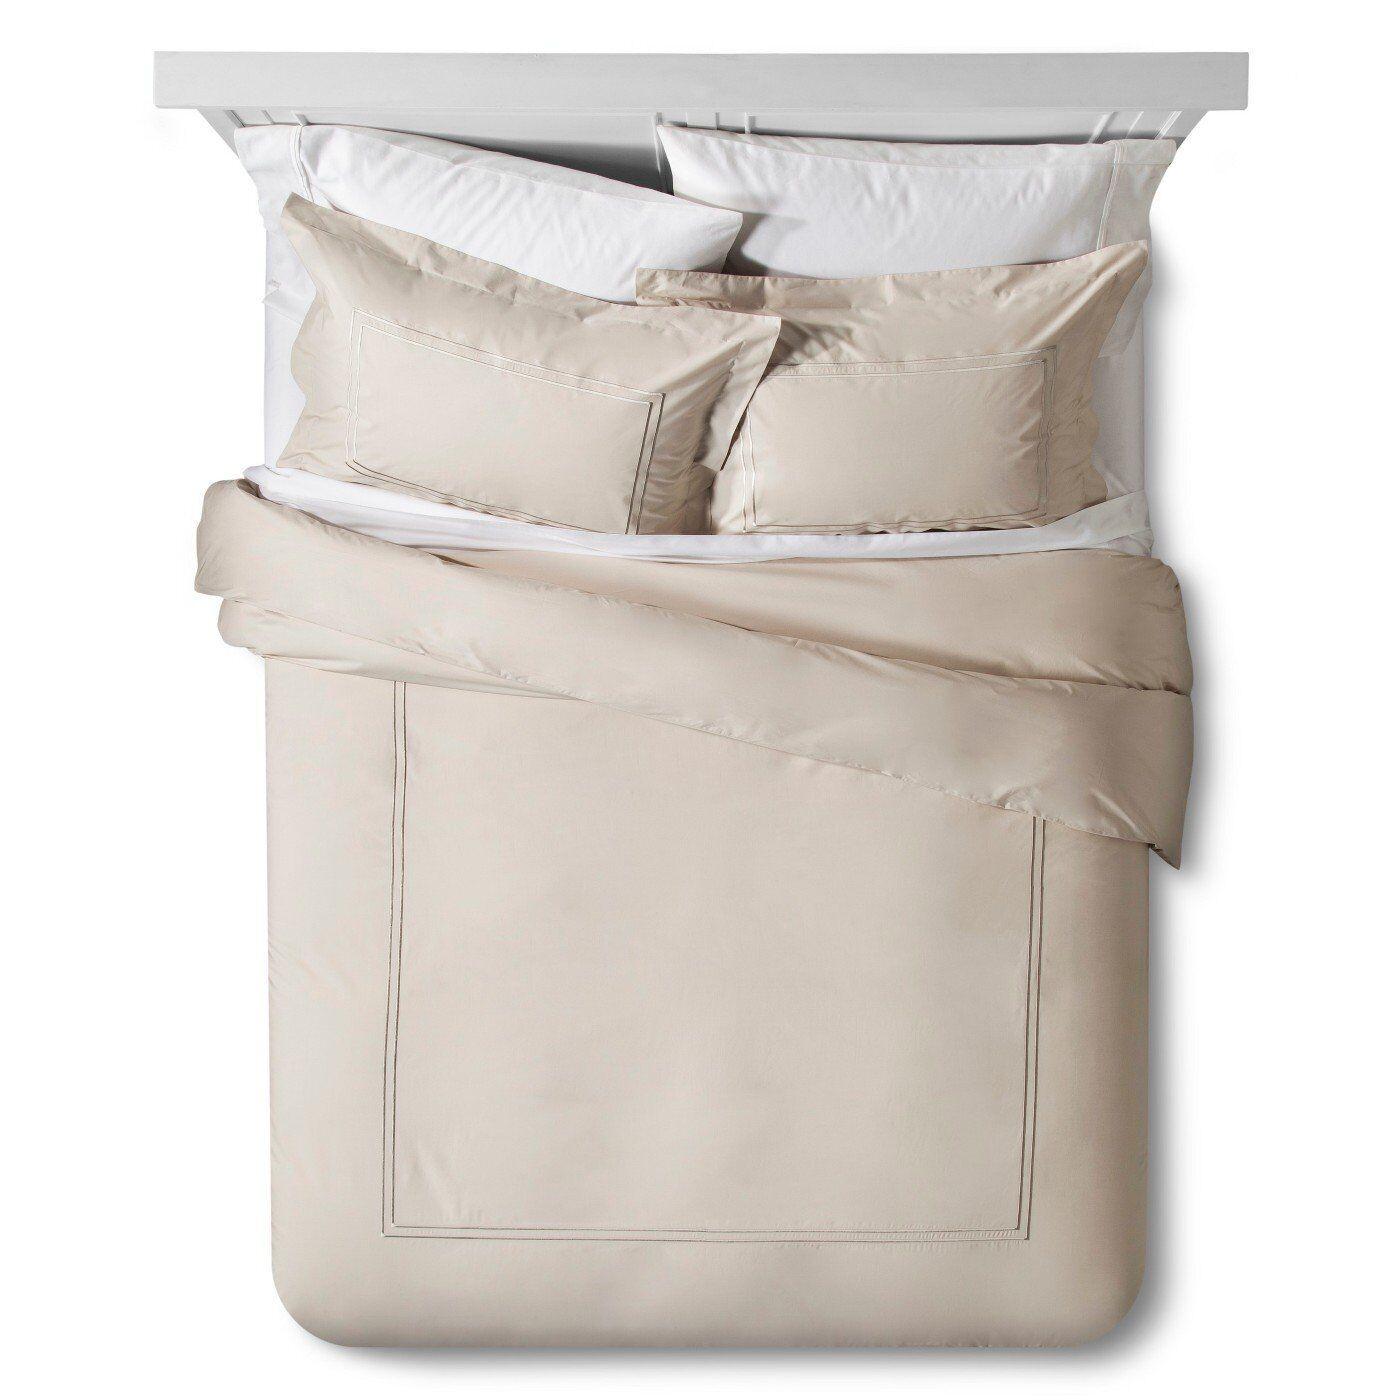 Fieldcrest Classic 100% Cotton 3pc Hotel Duvet & Sham Set – King – Sea Salt Bedding